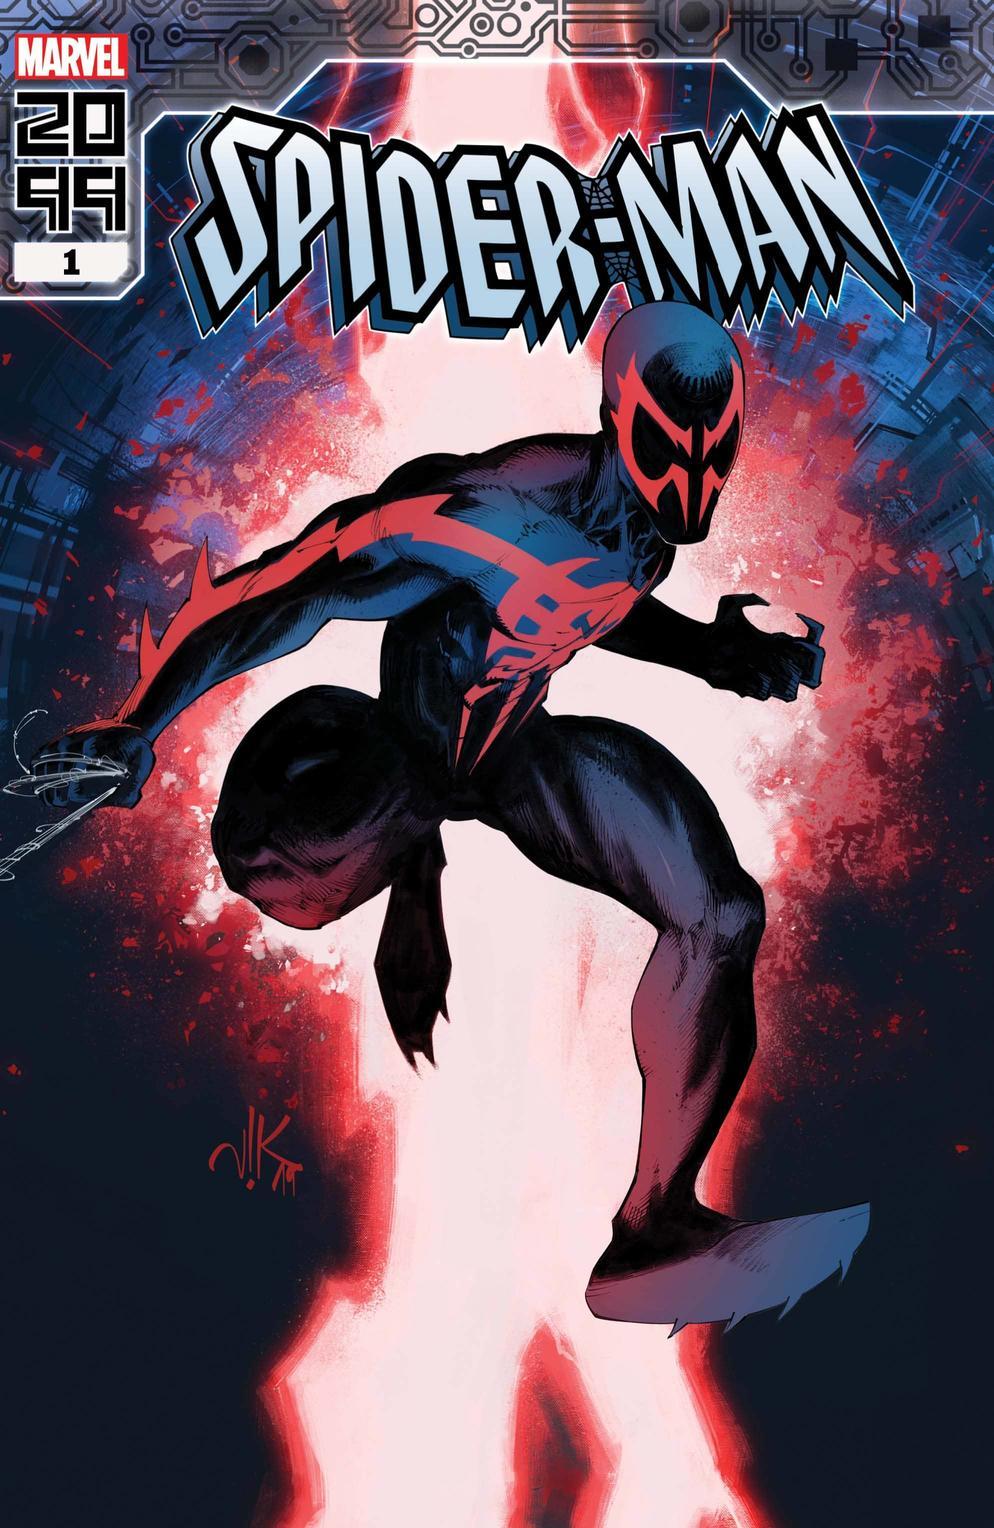 Spider-Man 2099 #1, copertina di Viktor Bogdanovic